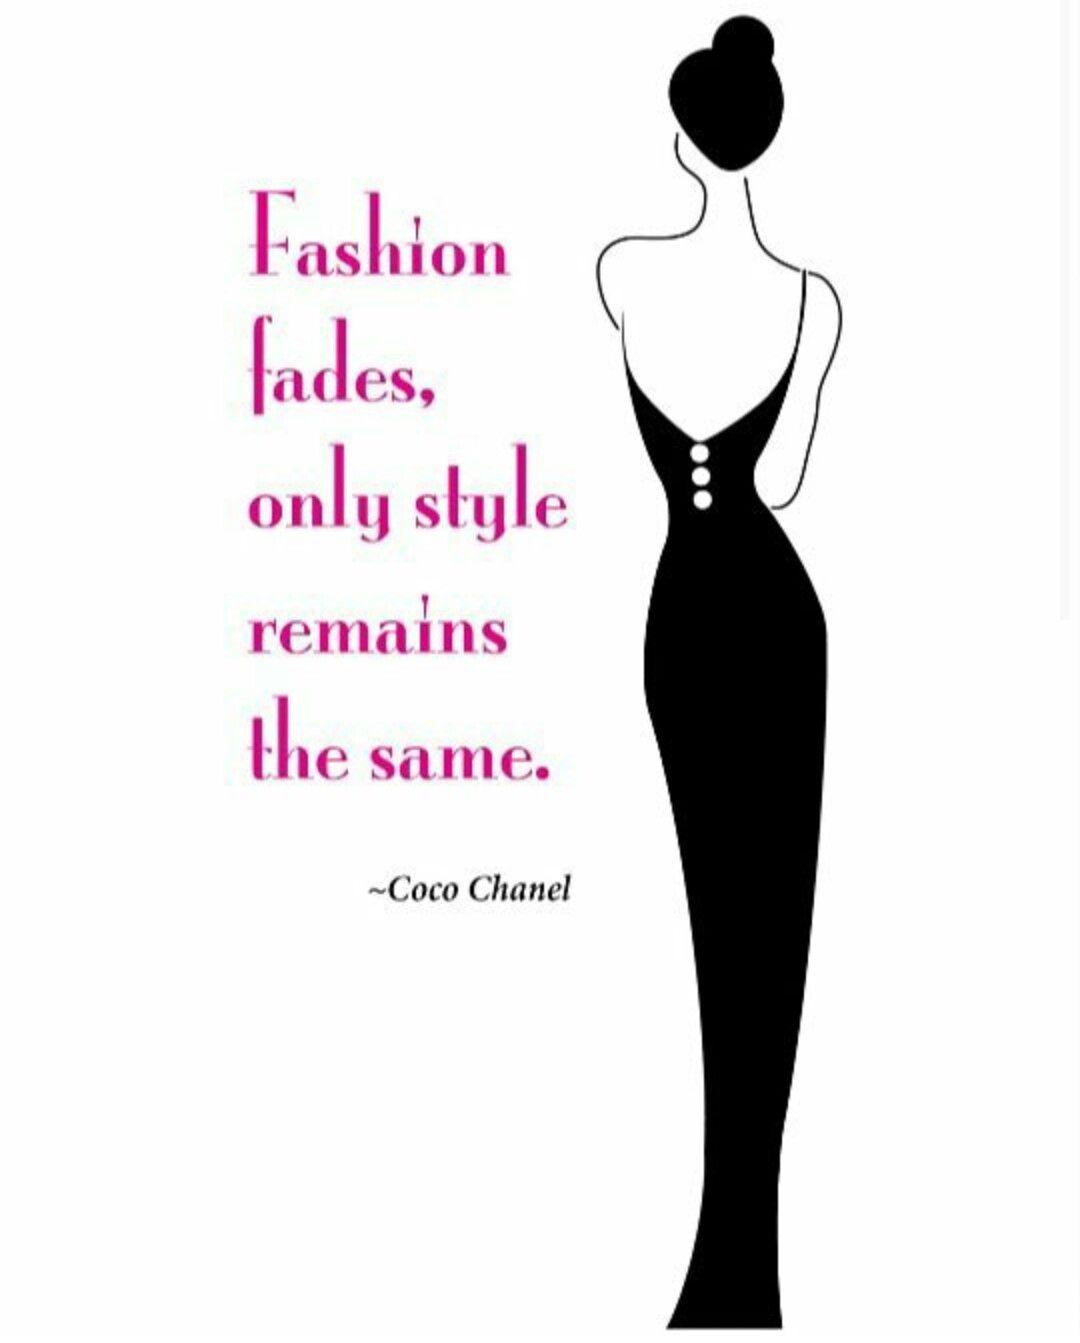 Coco Channel Coco Chanel Quotes Chanel Quotes Fashion Quotes